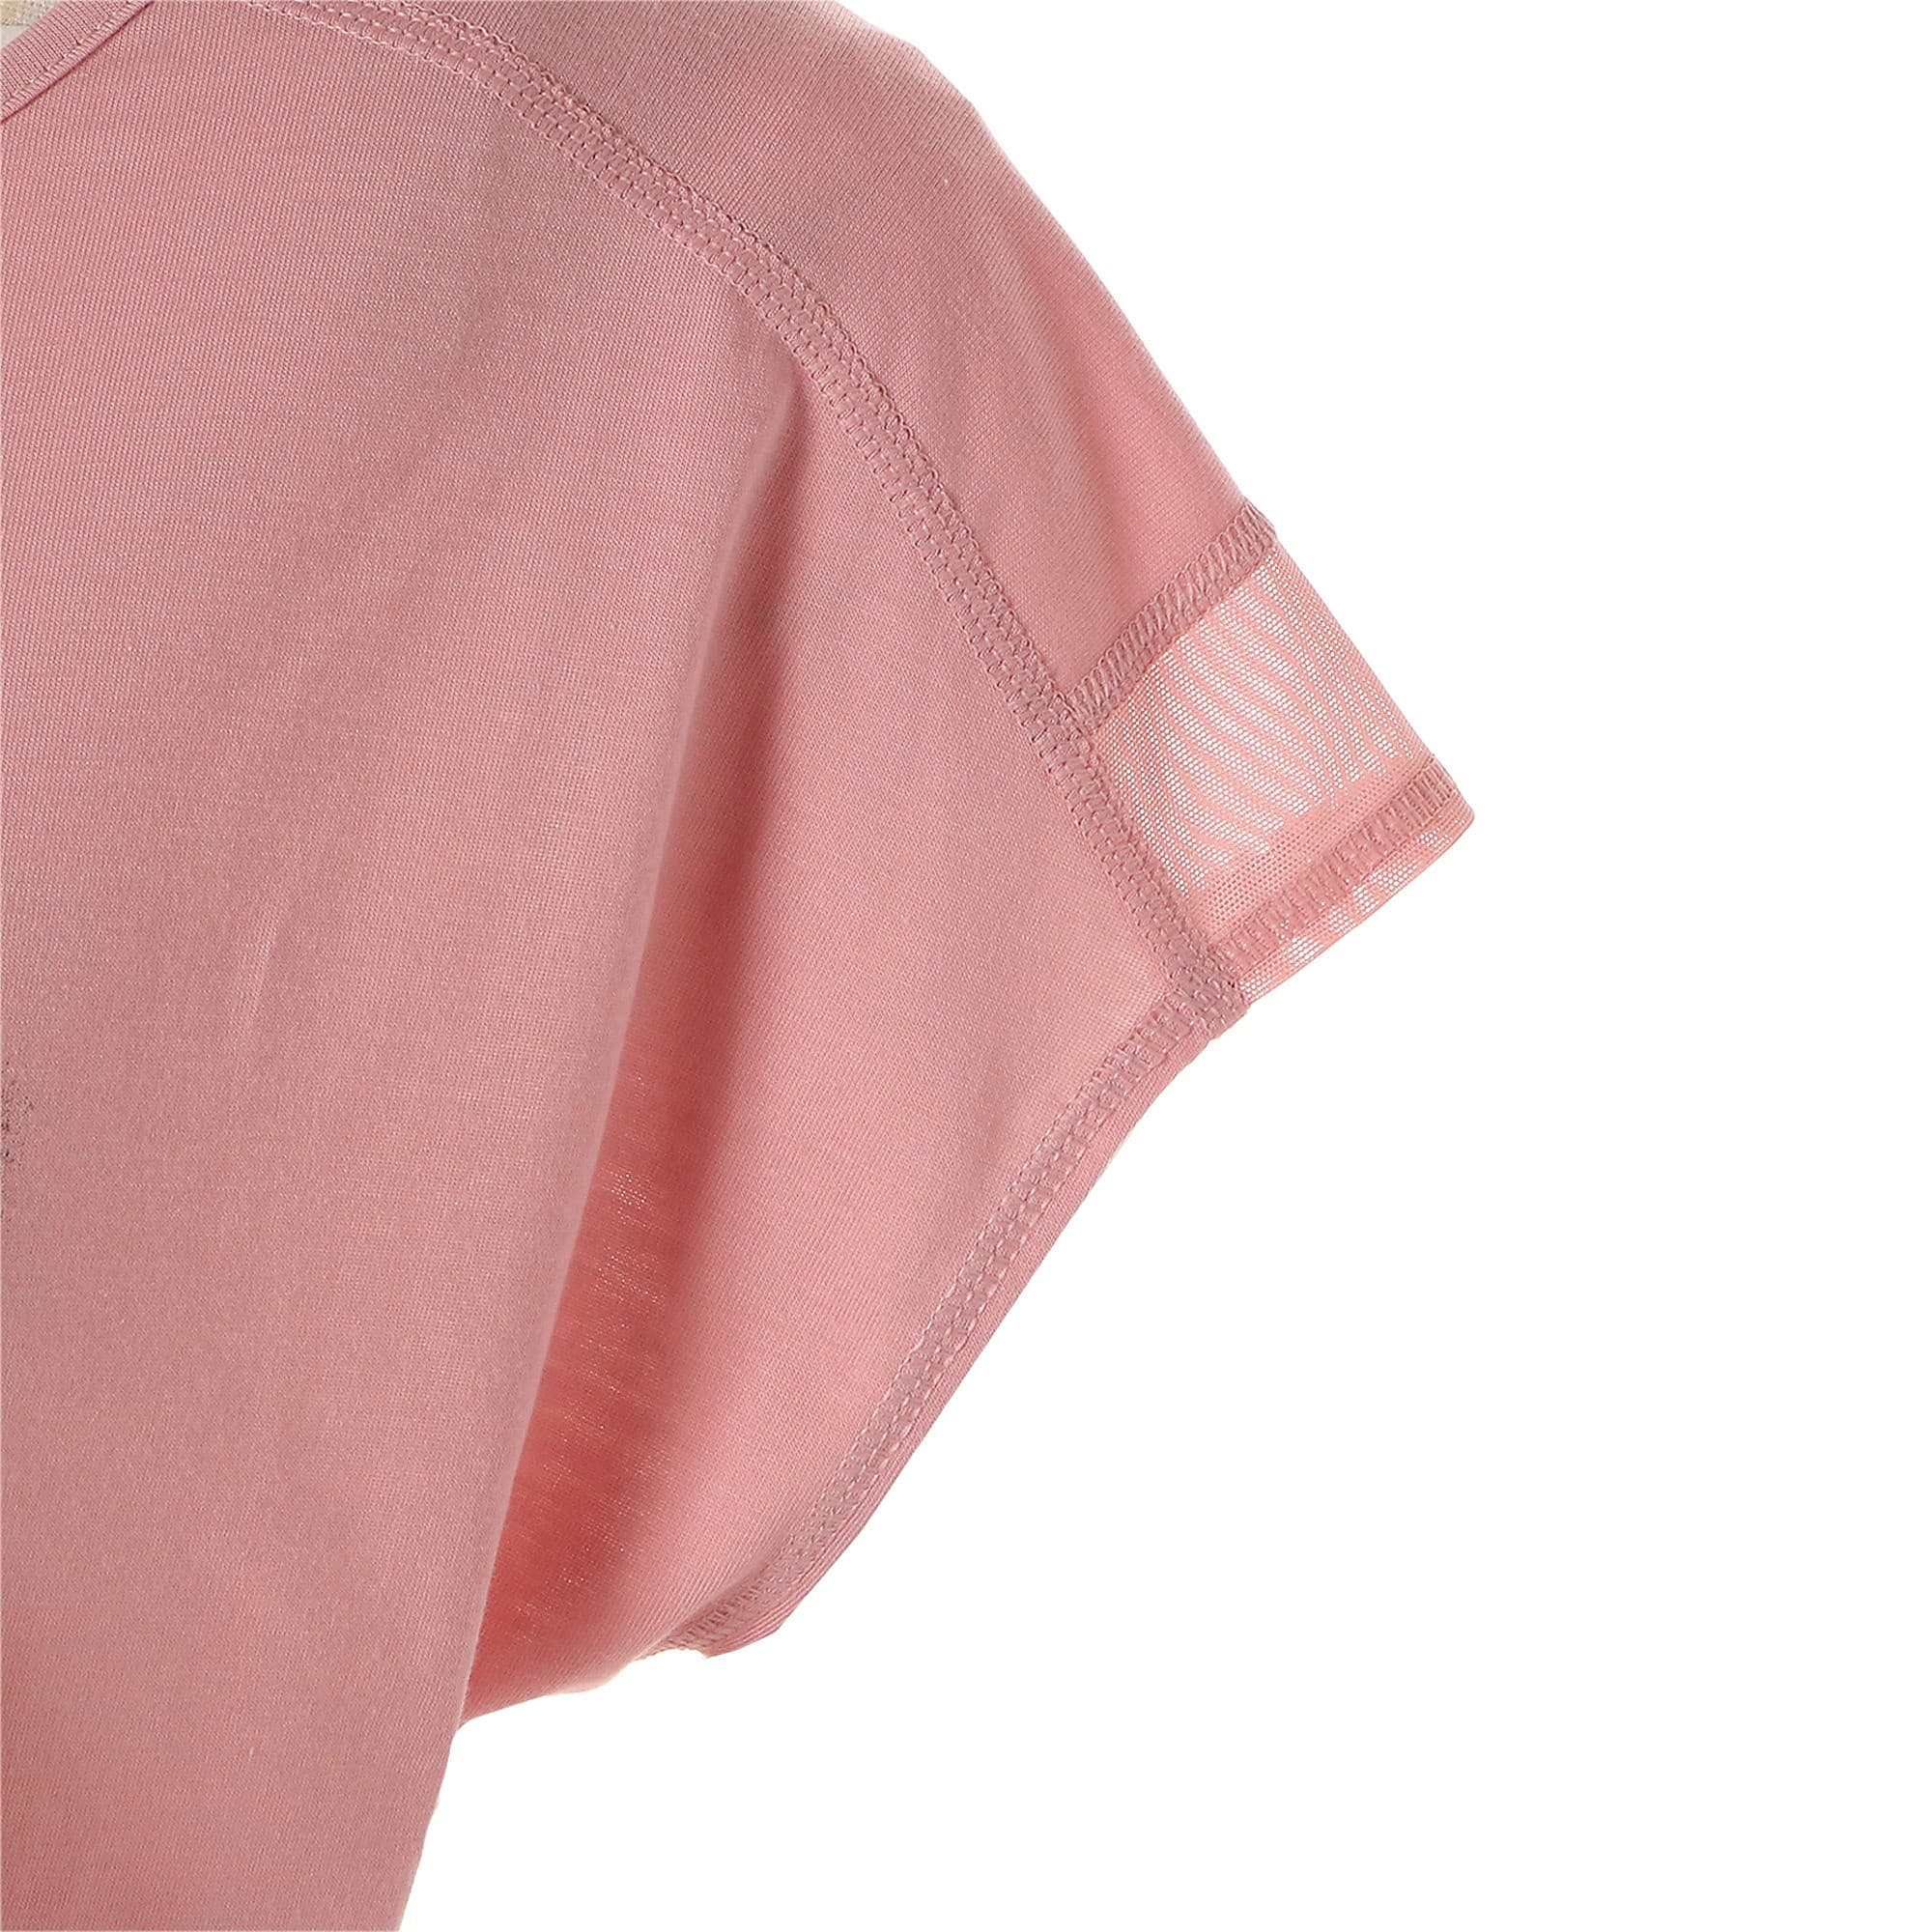 Thumbnail 8 of スタジオ SS ウィメンズ トレーニング メッシュ キャット Tシャツ 半袖, Bridal Rose, medium-JPN